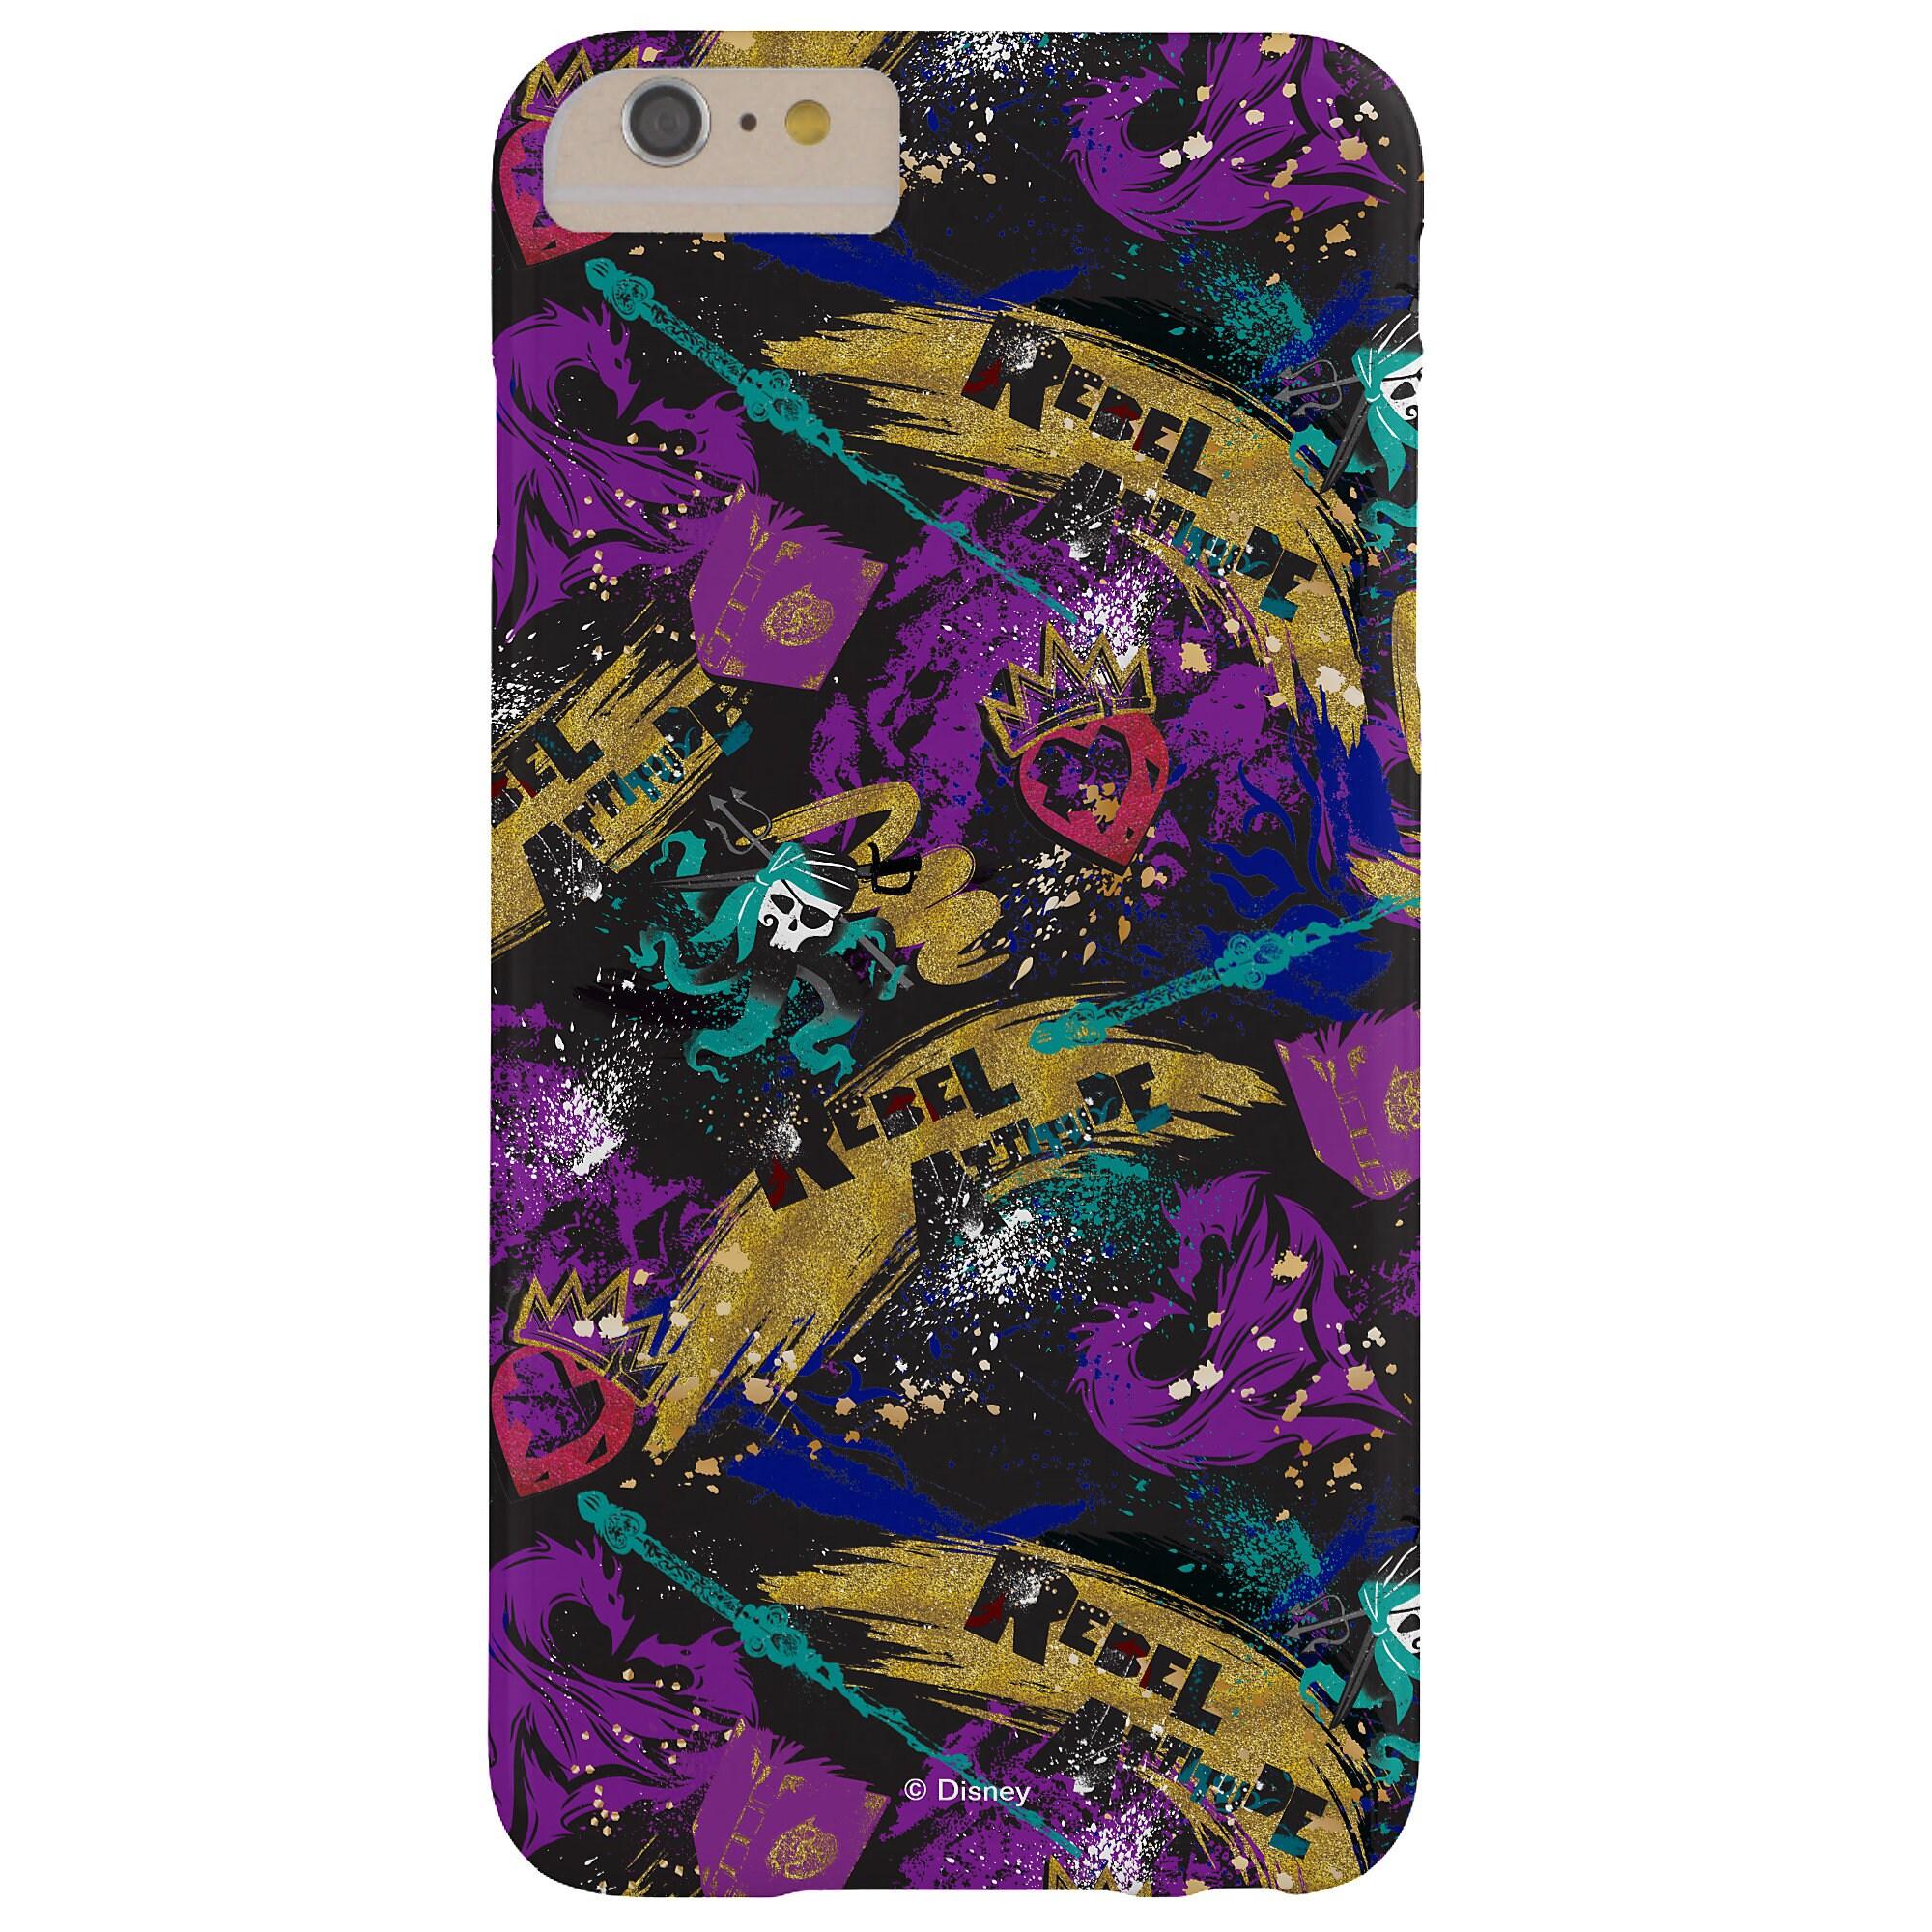 Descendants 2 Rebel Attitude iPhone 7/6/6S Plus Case - Customizable